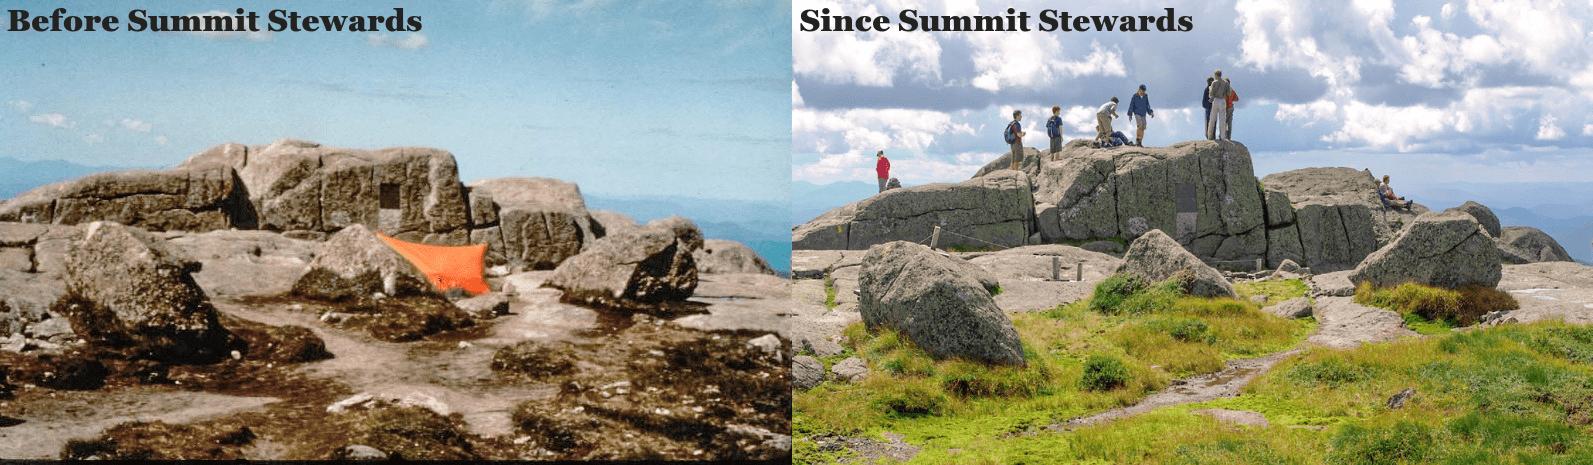 Mt. Marcy since Summit Stewards